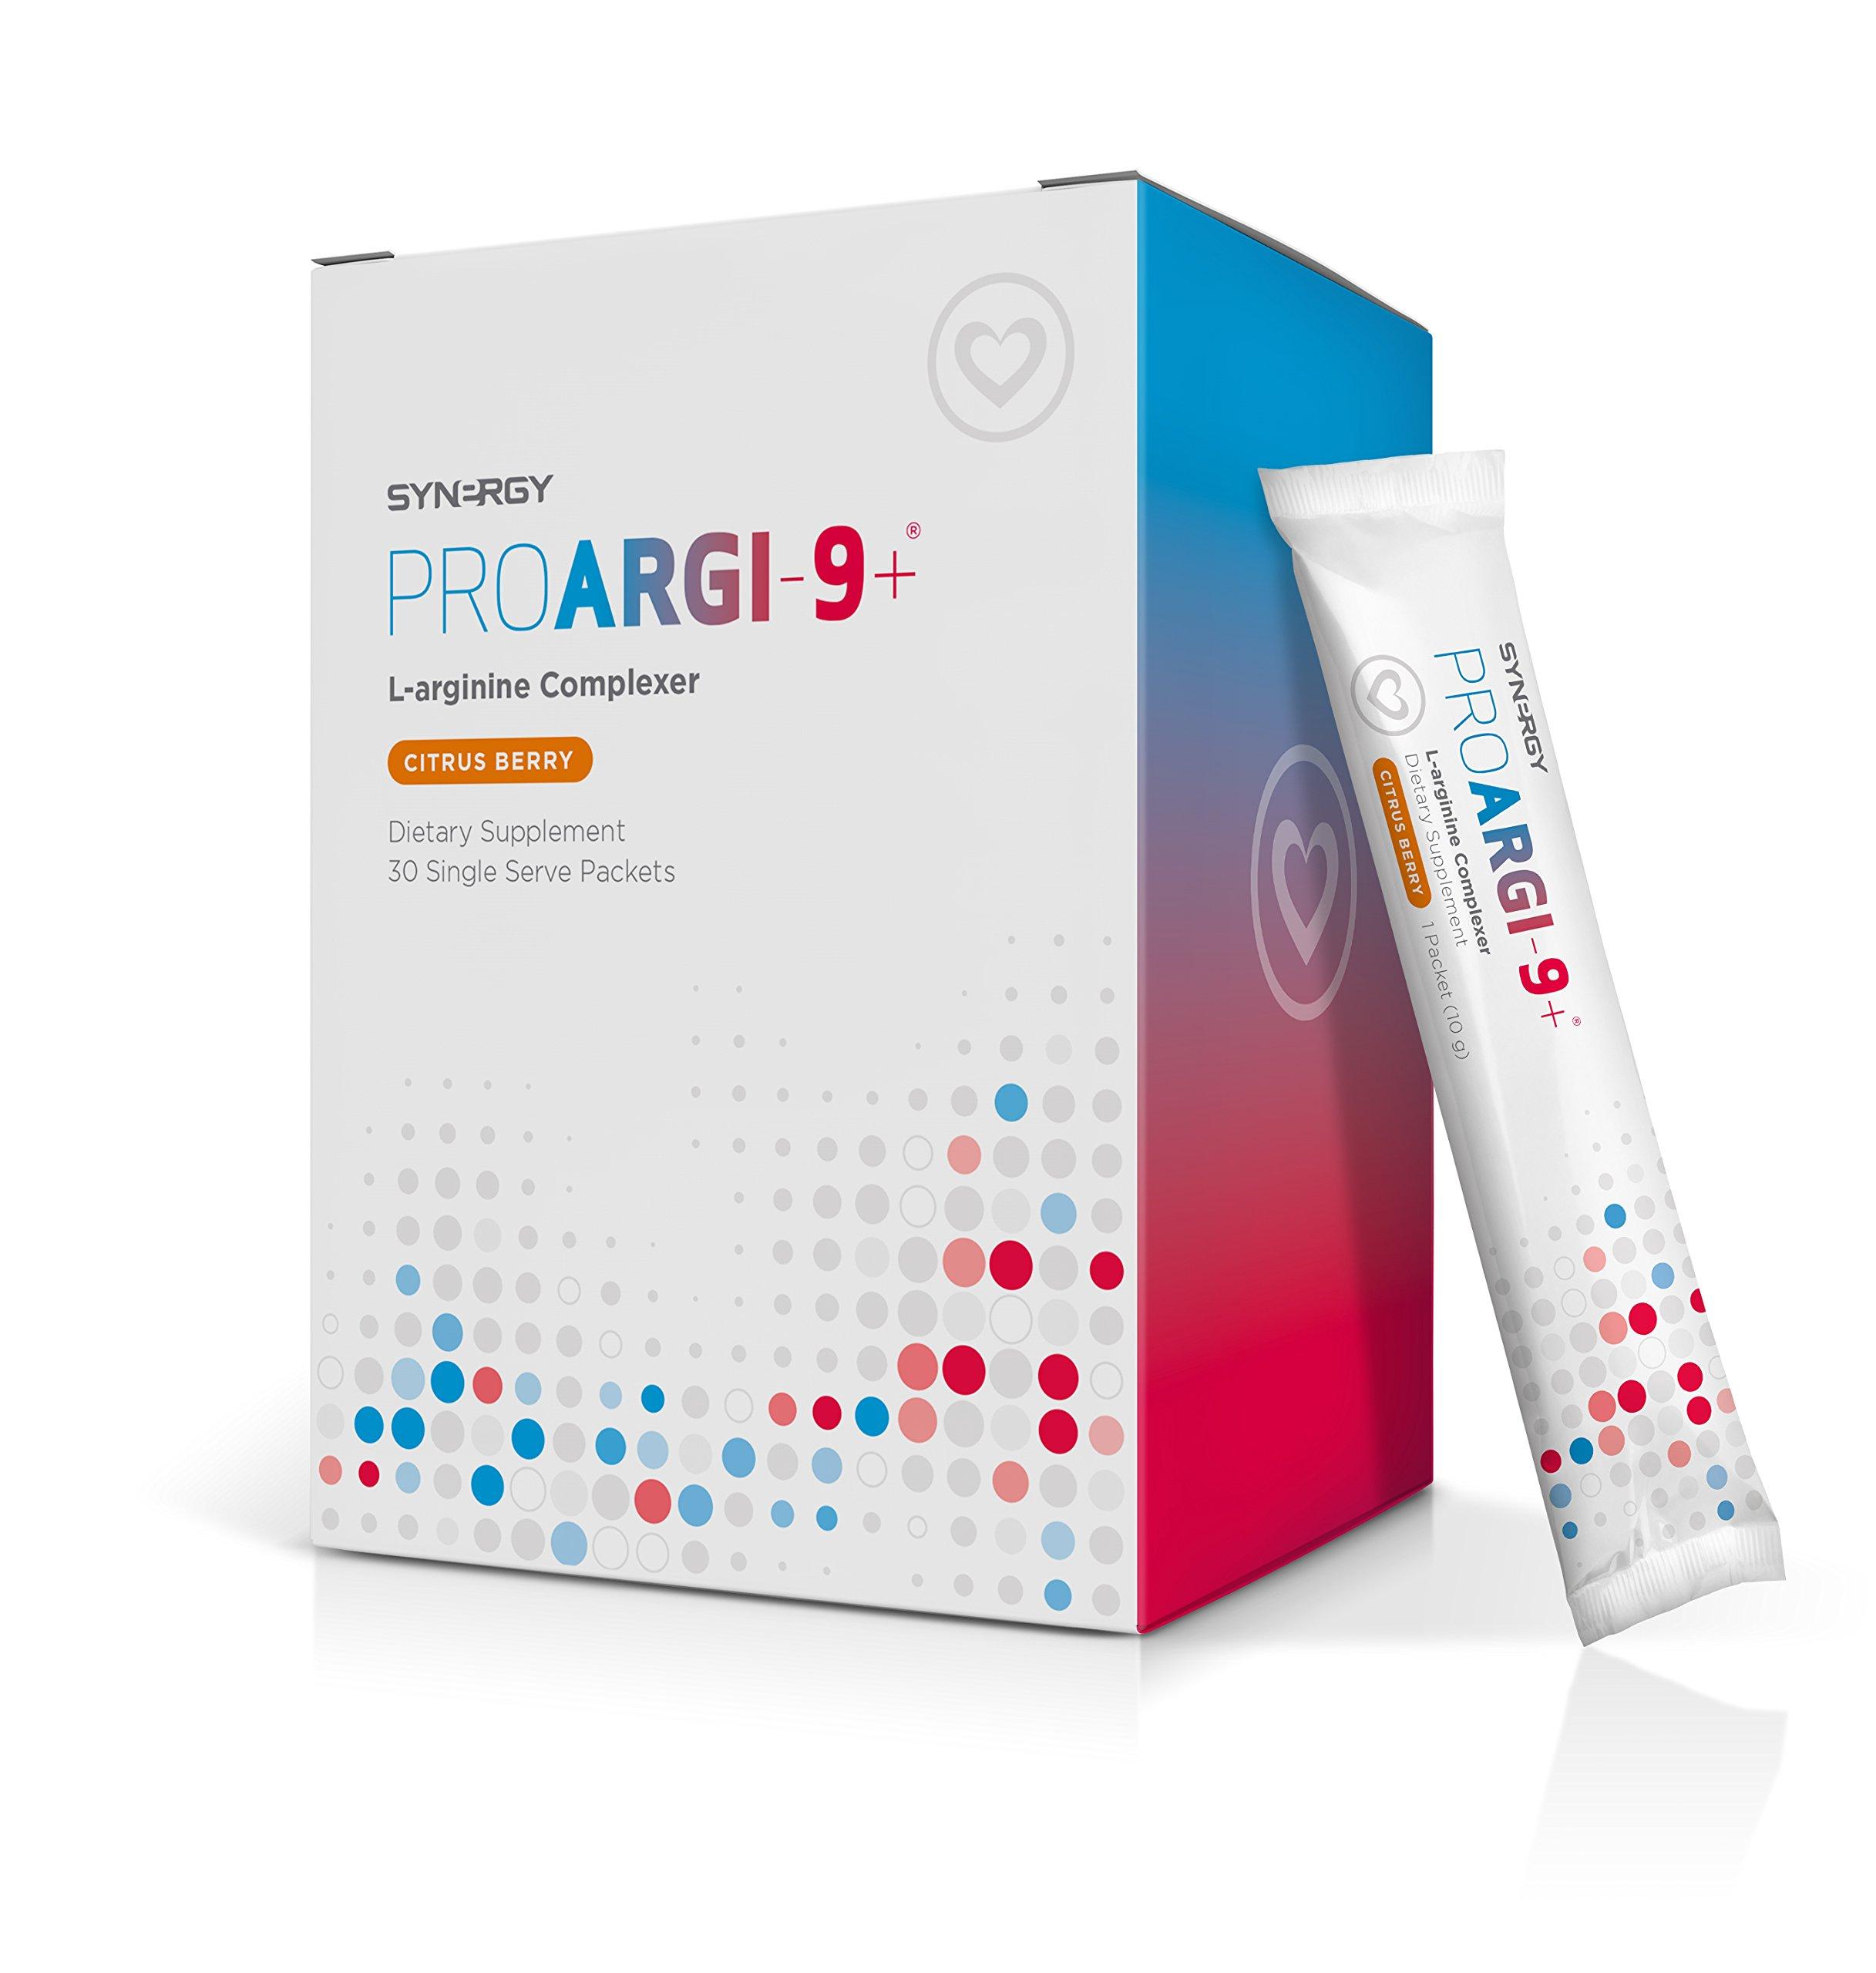 Proargi 9 Plus L-arginine Citrus Berry 30 Packs by Proargi 9